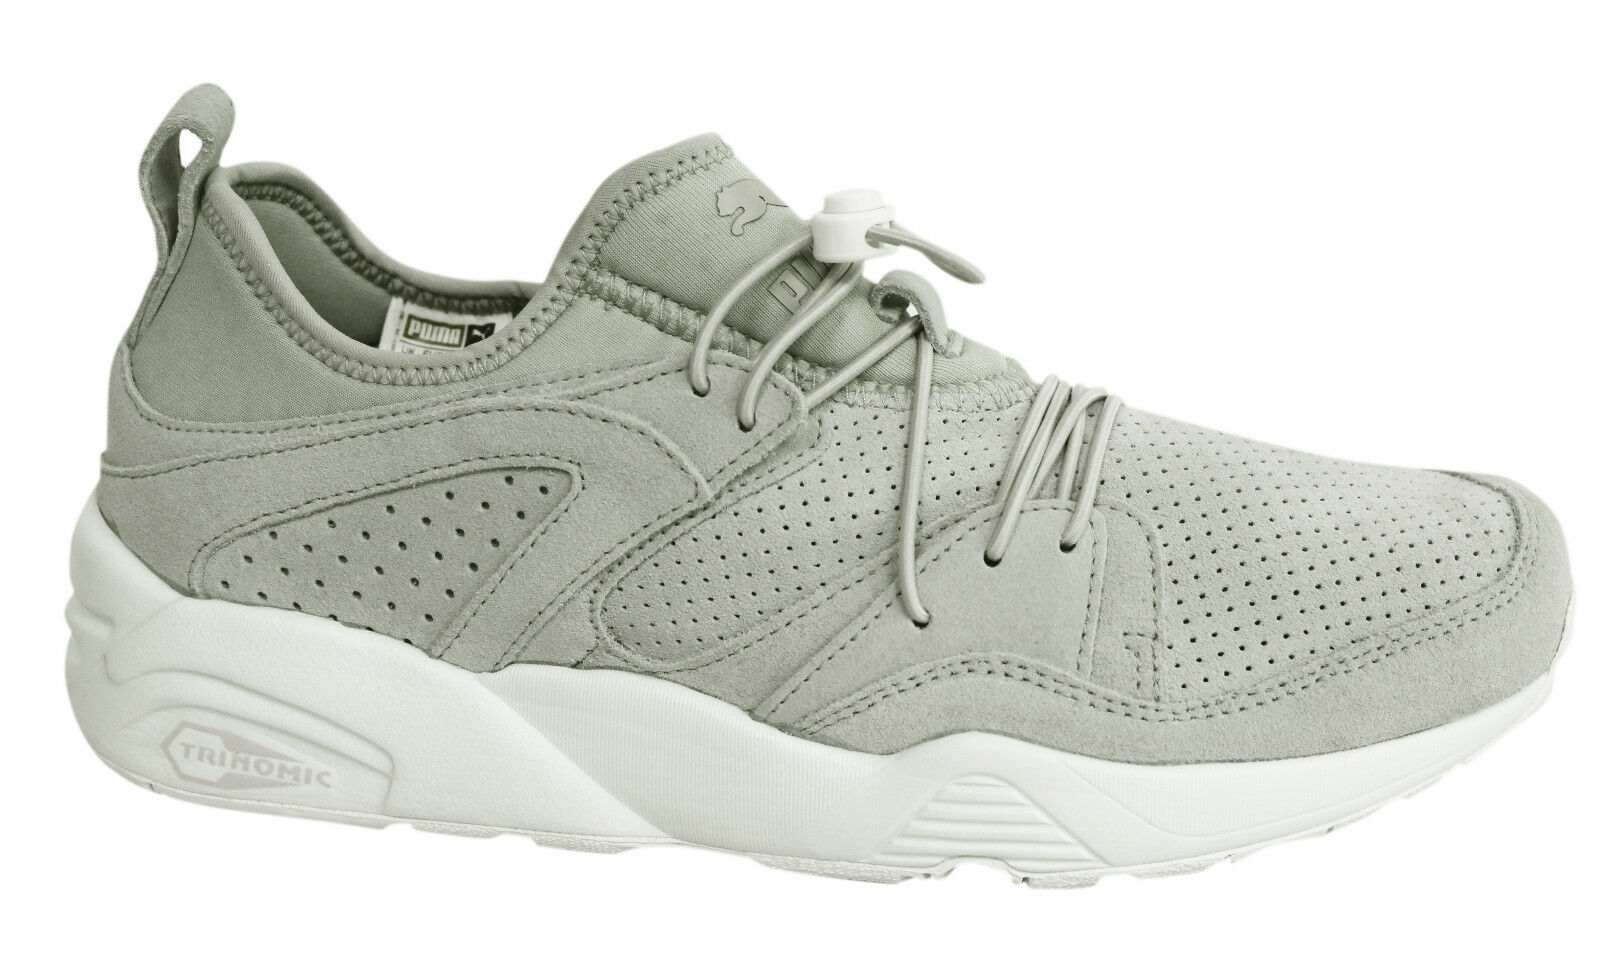 Puma Trinomic Blaze of Glory Soft Mens Grey Trainers Shoes 360101 07 ... a7be65f15